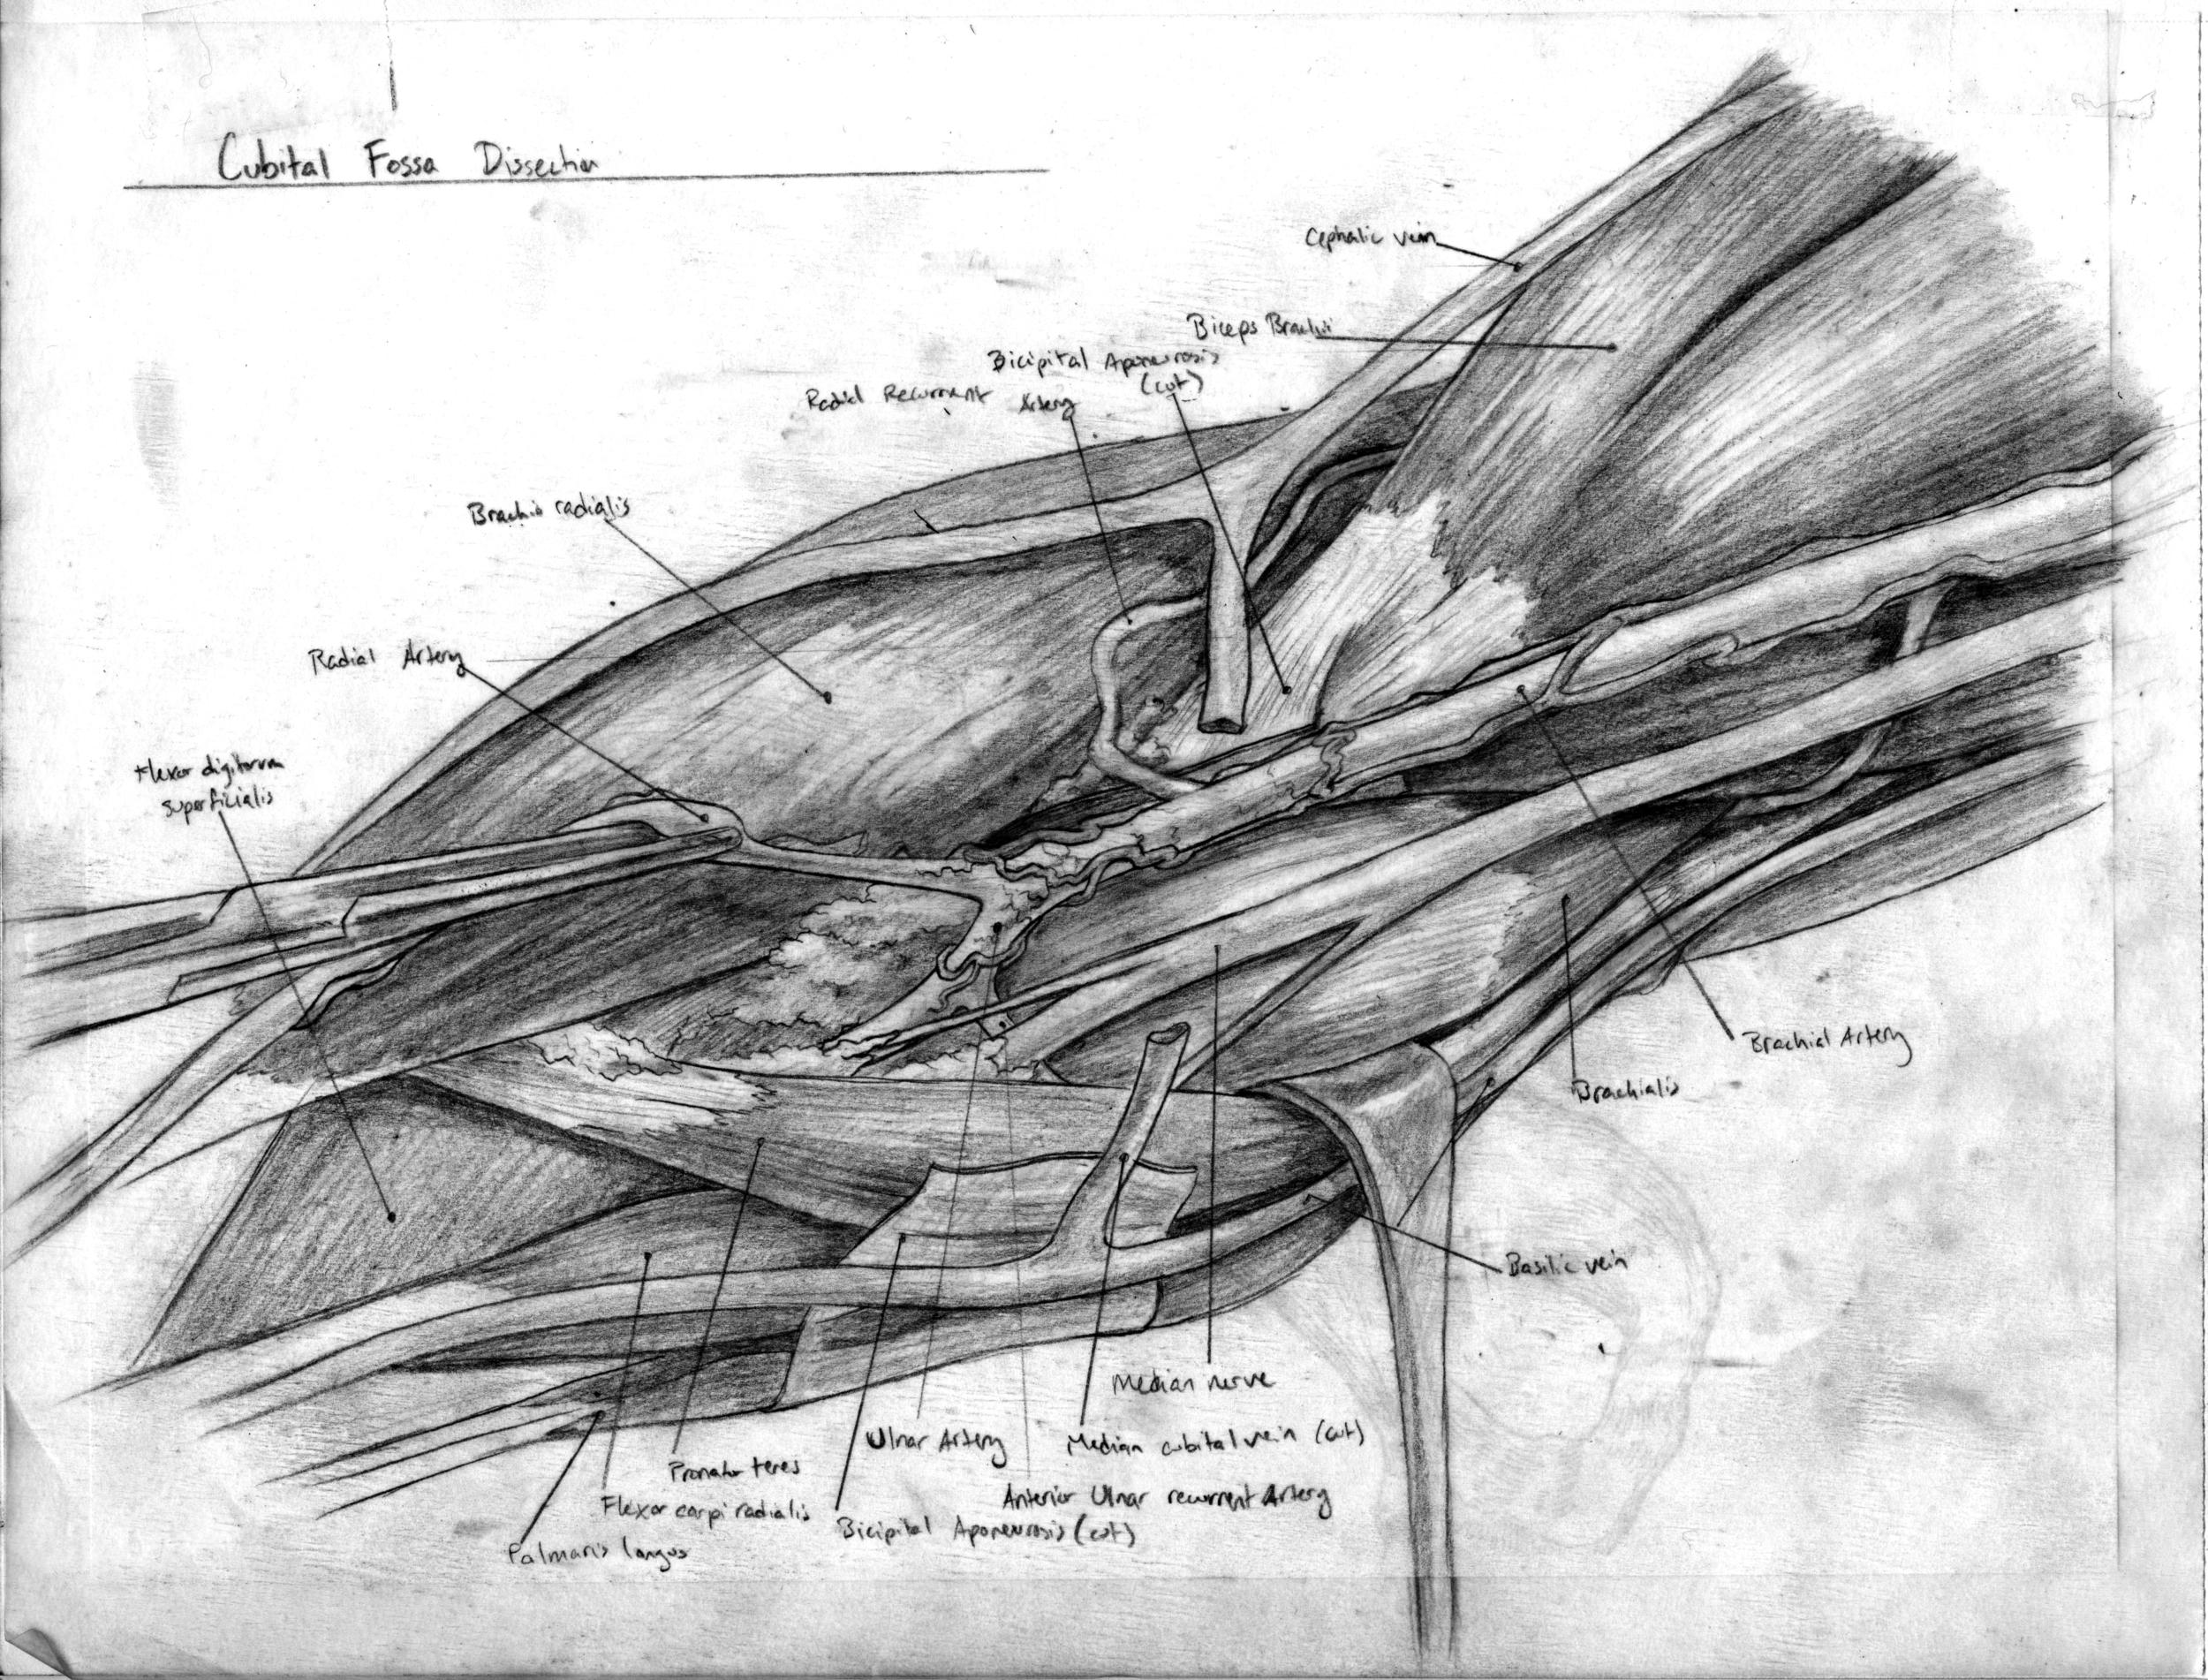 Cubital Fossa Dissection